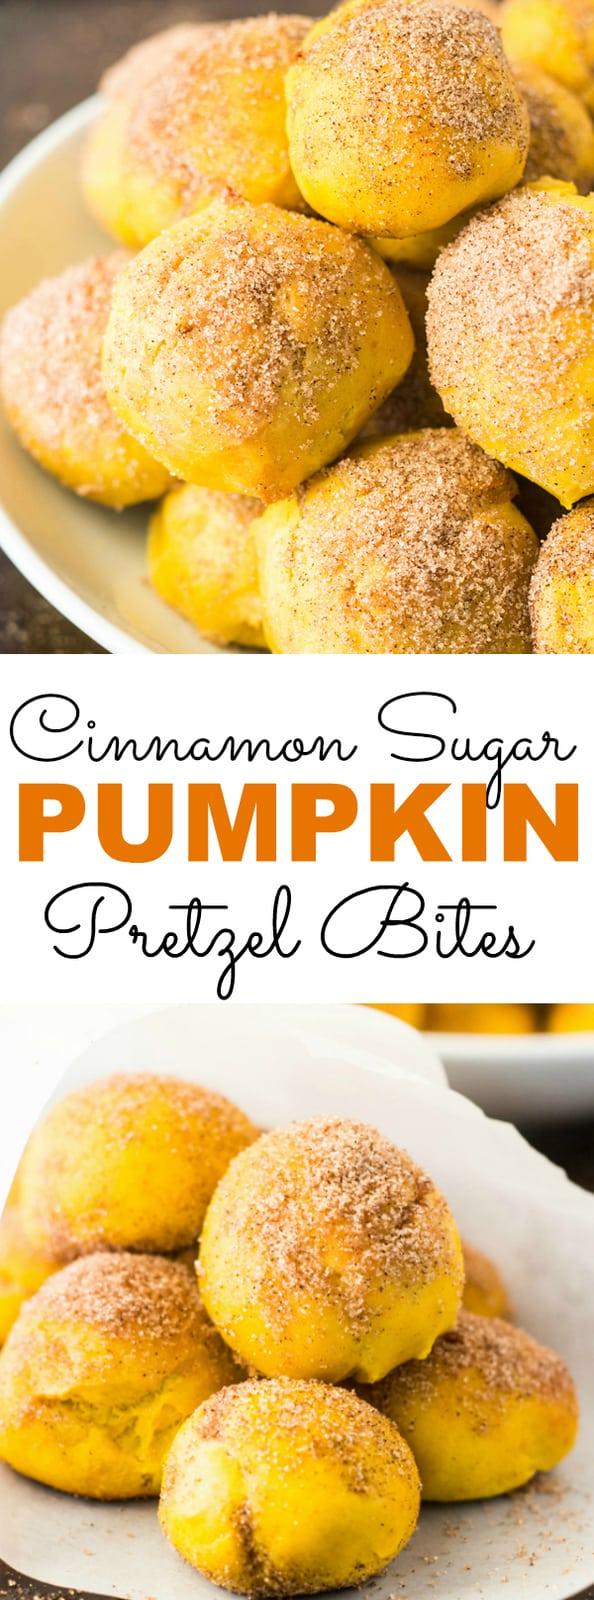 Cinnamon Sugar Pumpkin Pretzel Bites